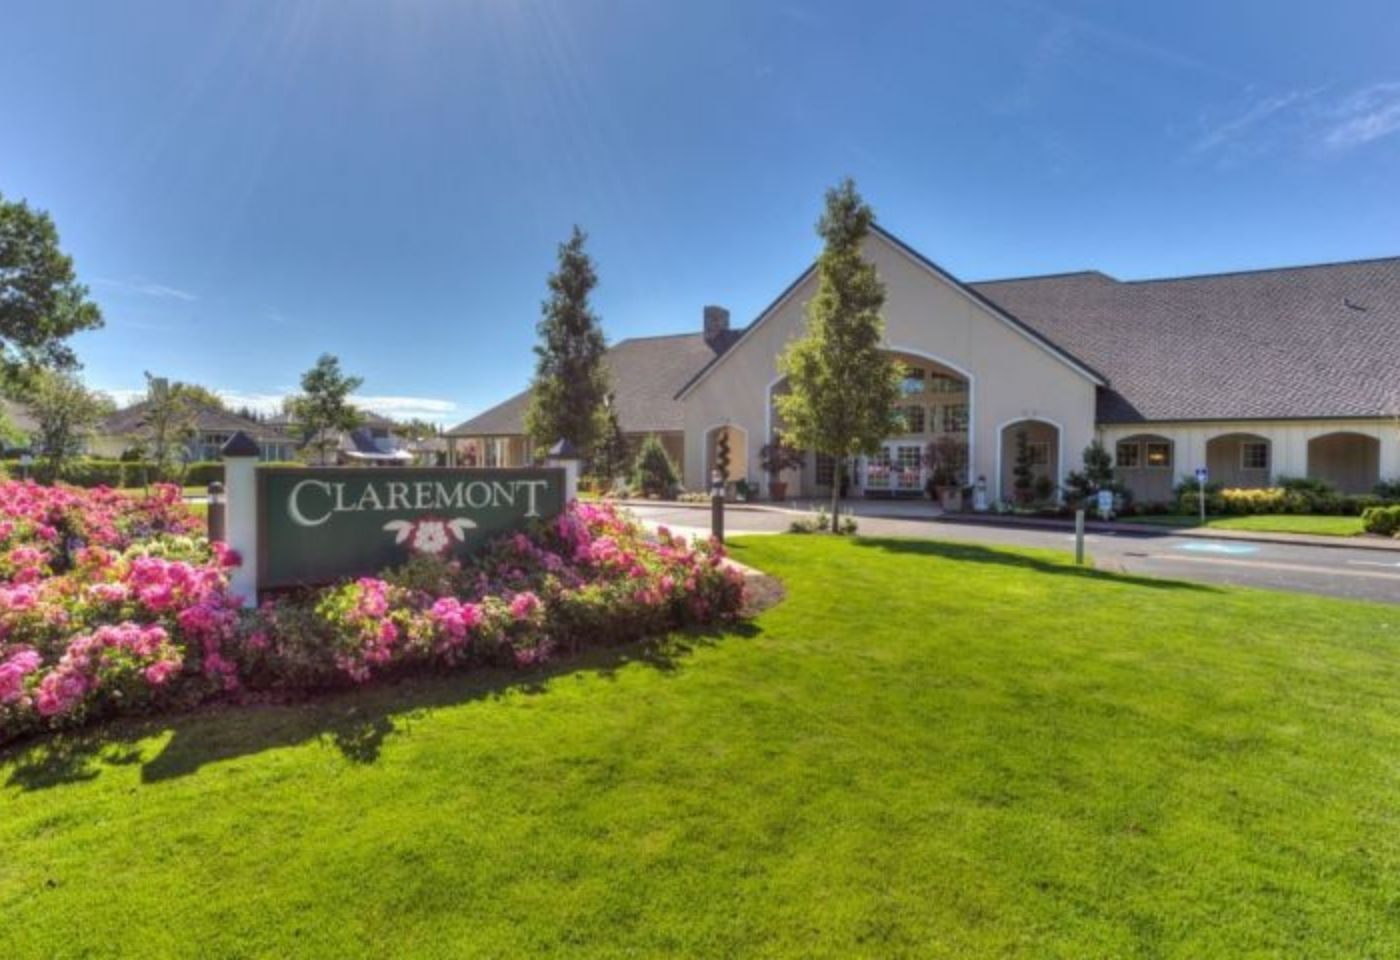 Claremont entrance of Oregon